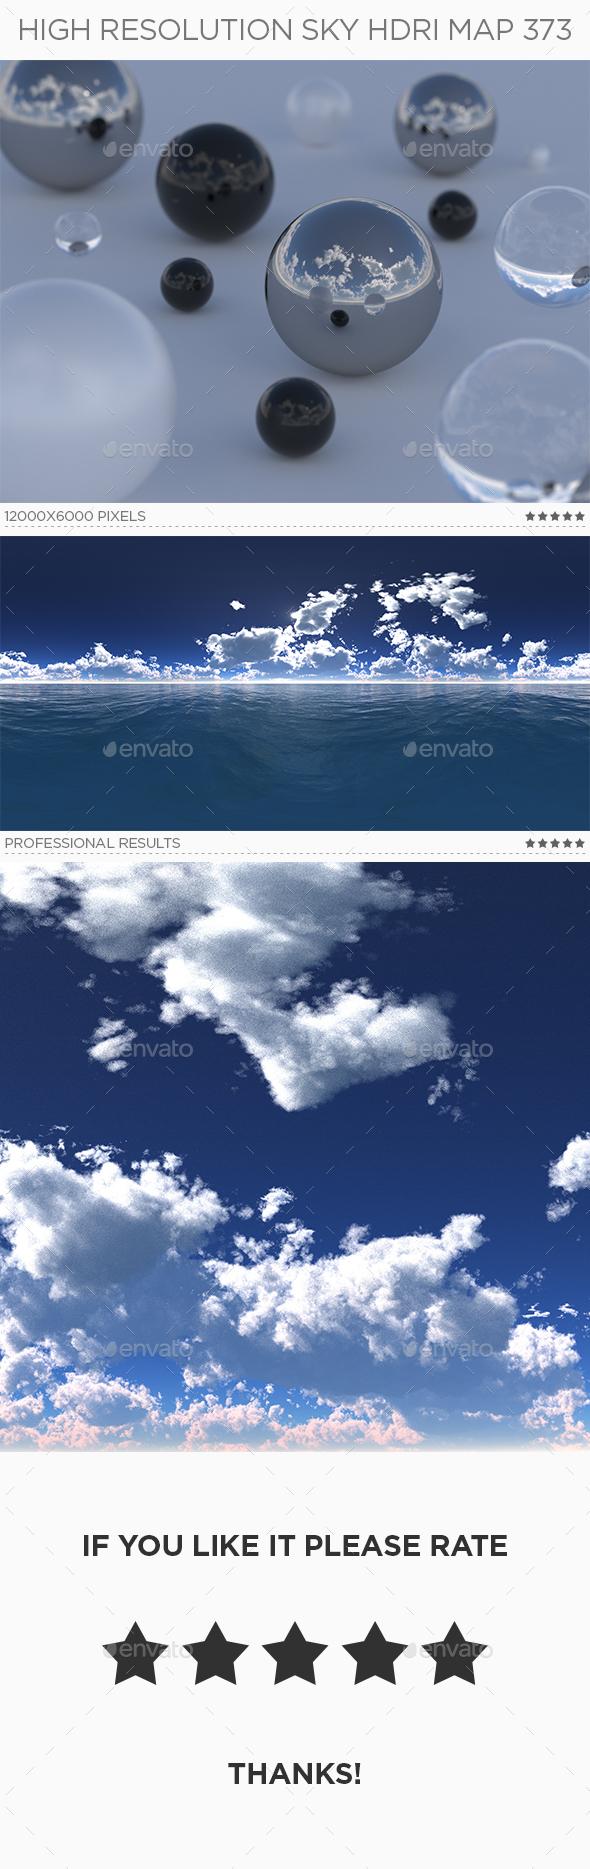 High Resolution Sky HDRi Map 373 - 3DOcean Item for Sale